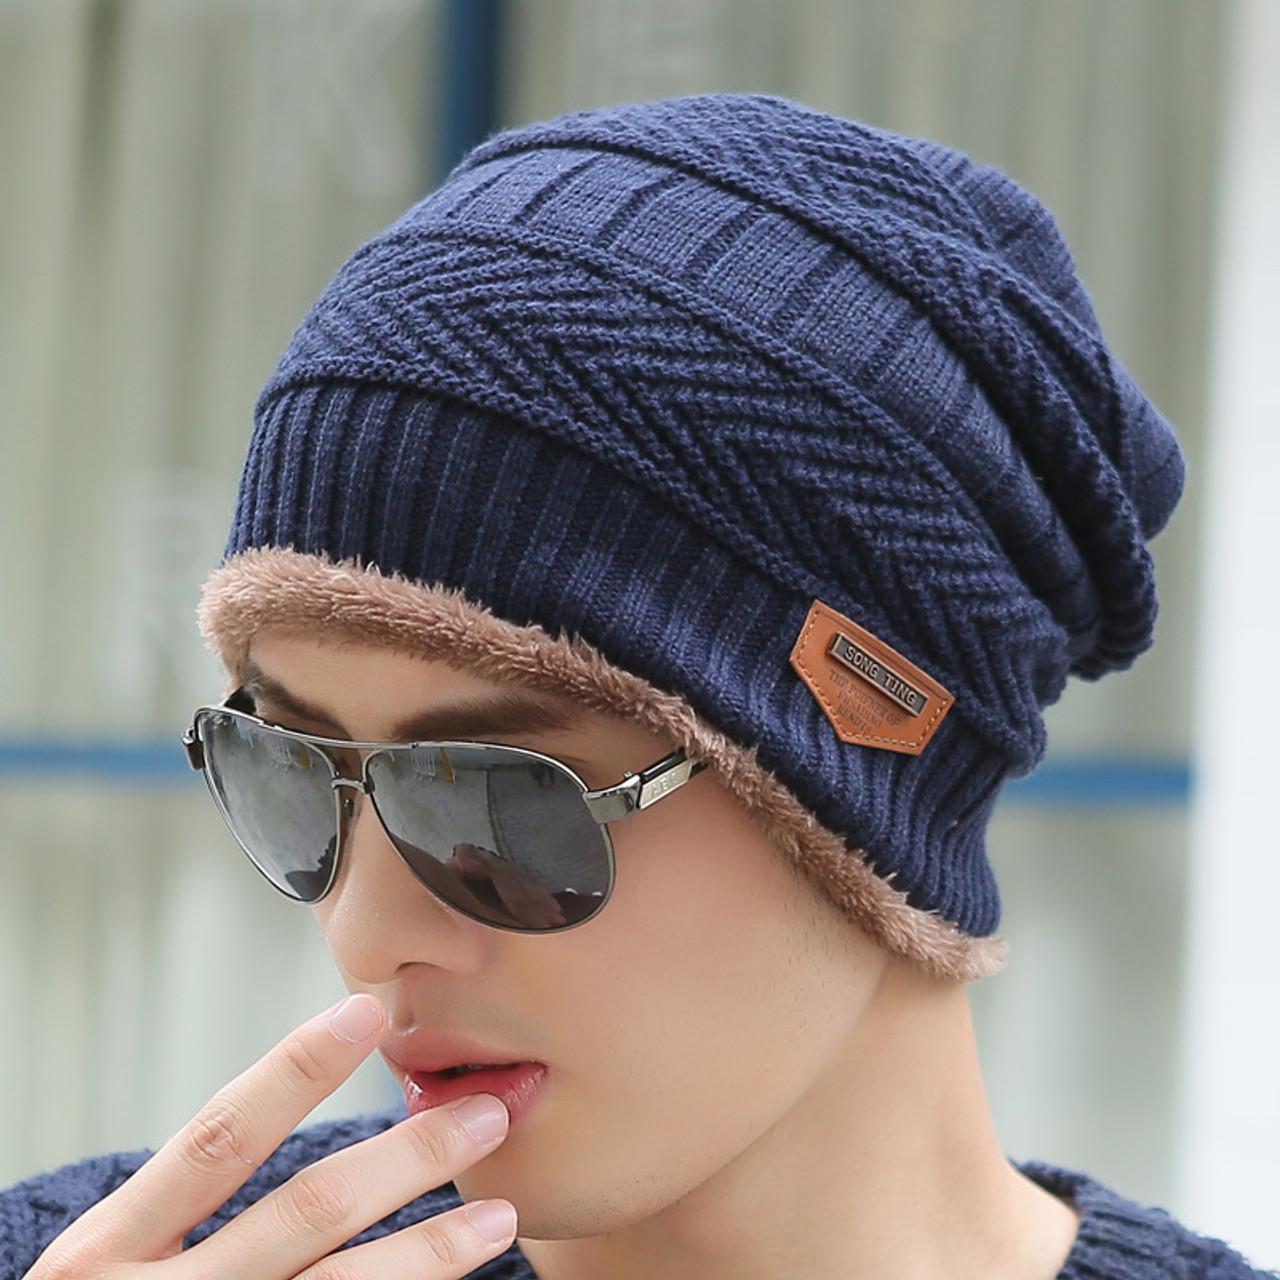 1e94a237509c0 ... Boys Men Winter Hat Knit Scarf Cap Winter Hats for Men Caps Warm Fur  Skullies Beanie ...